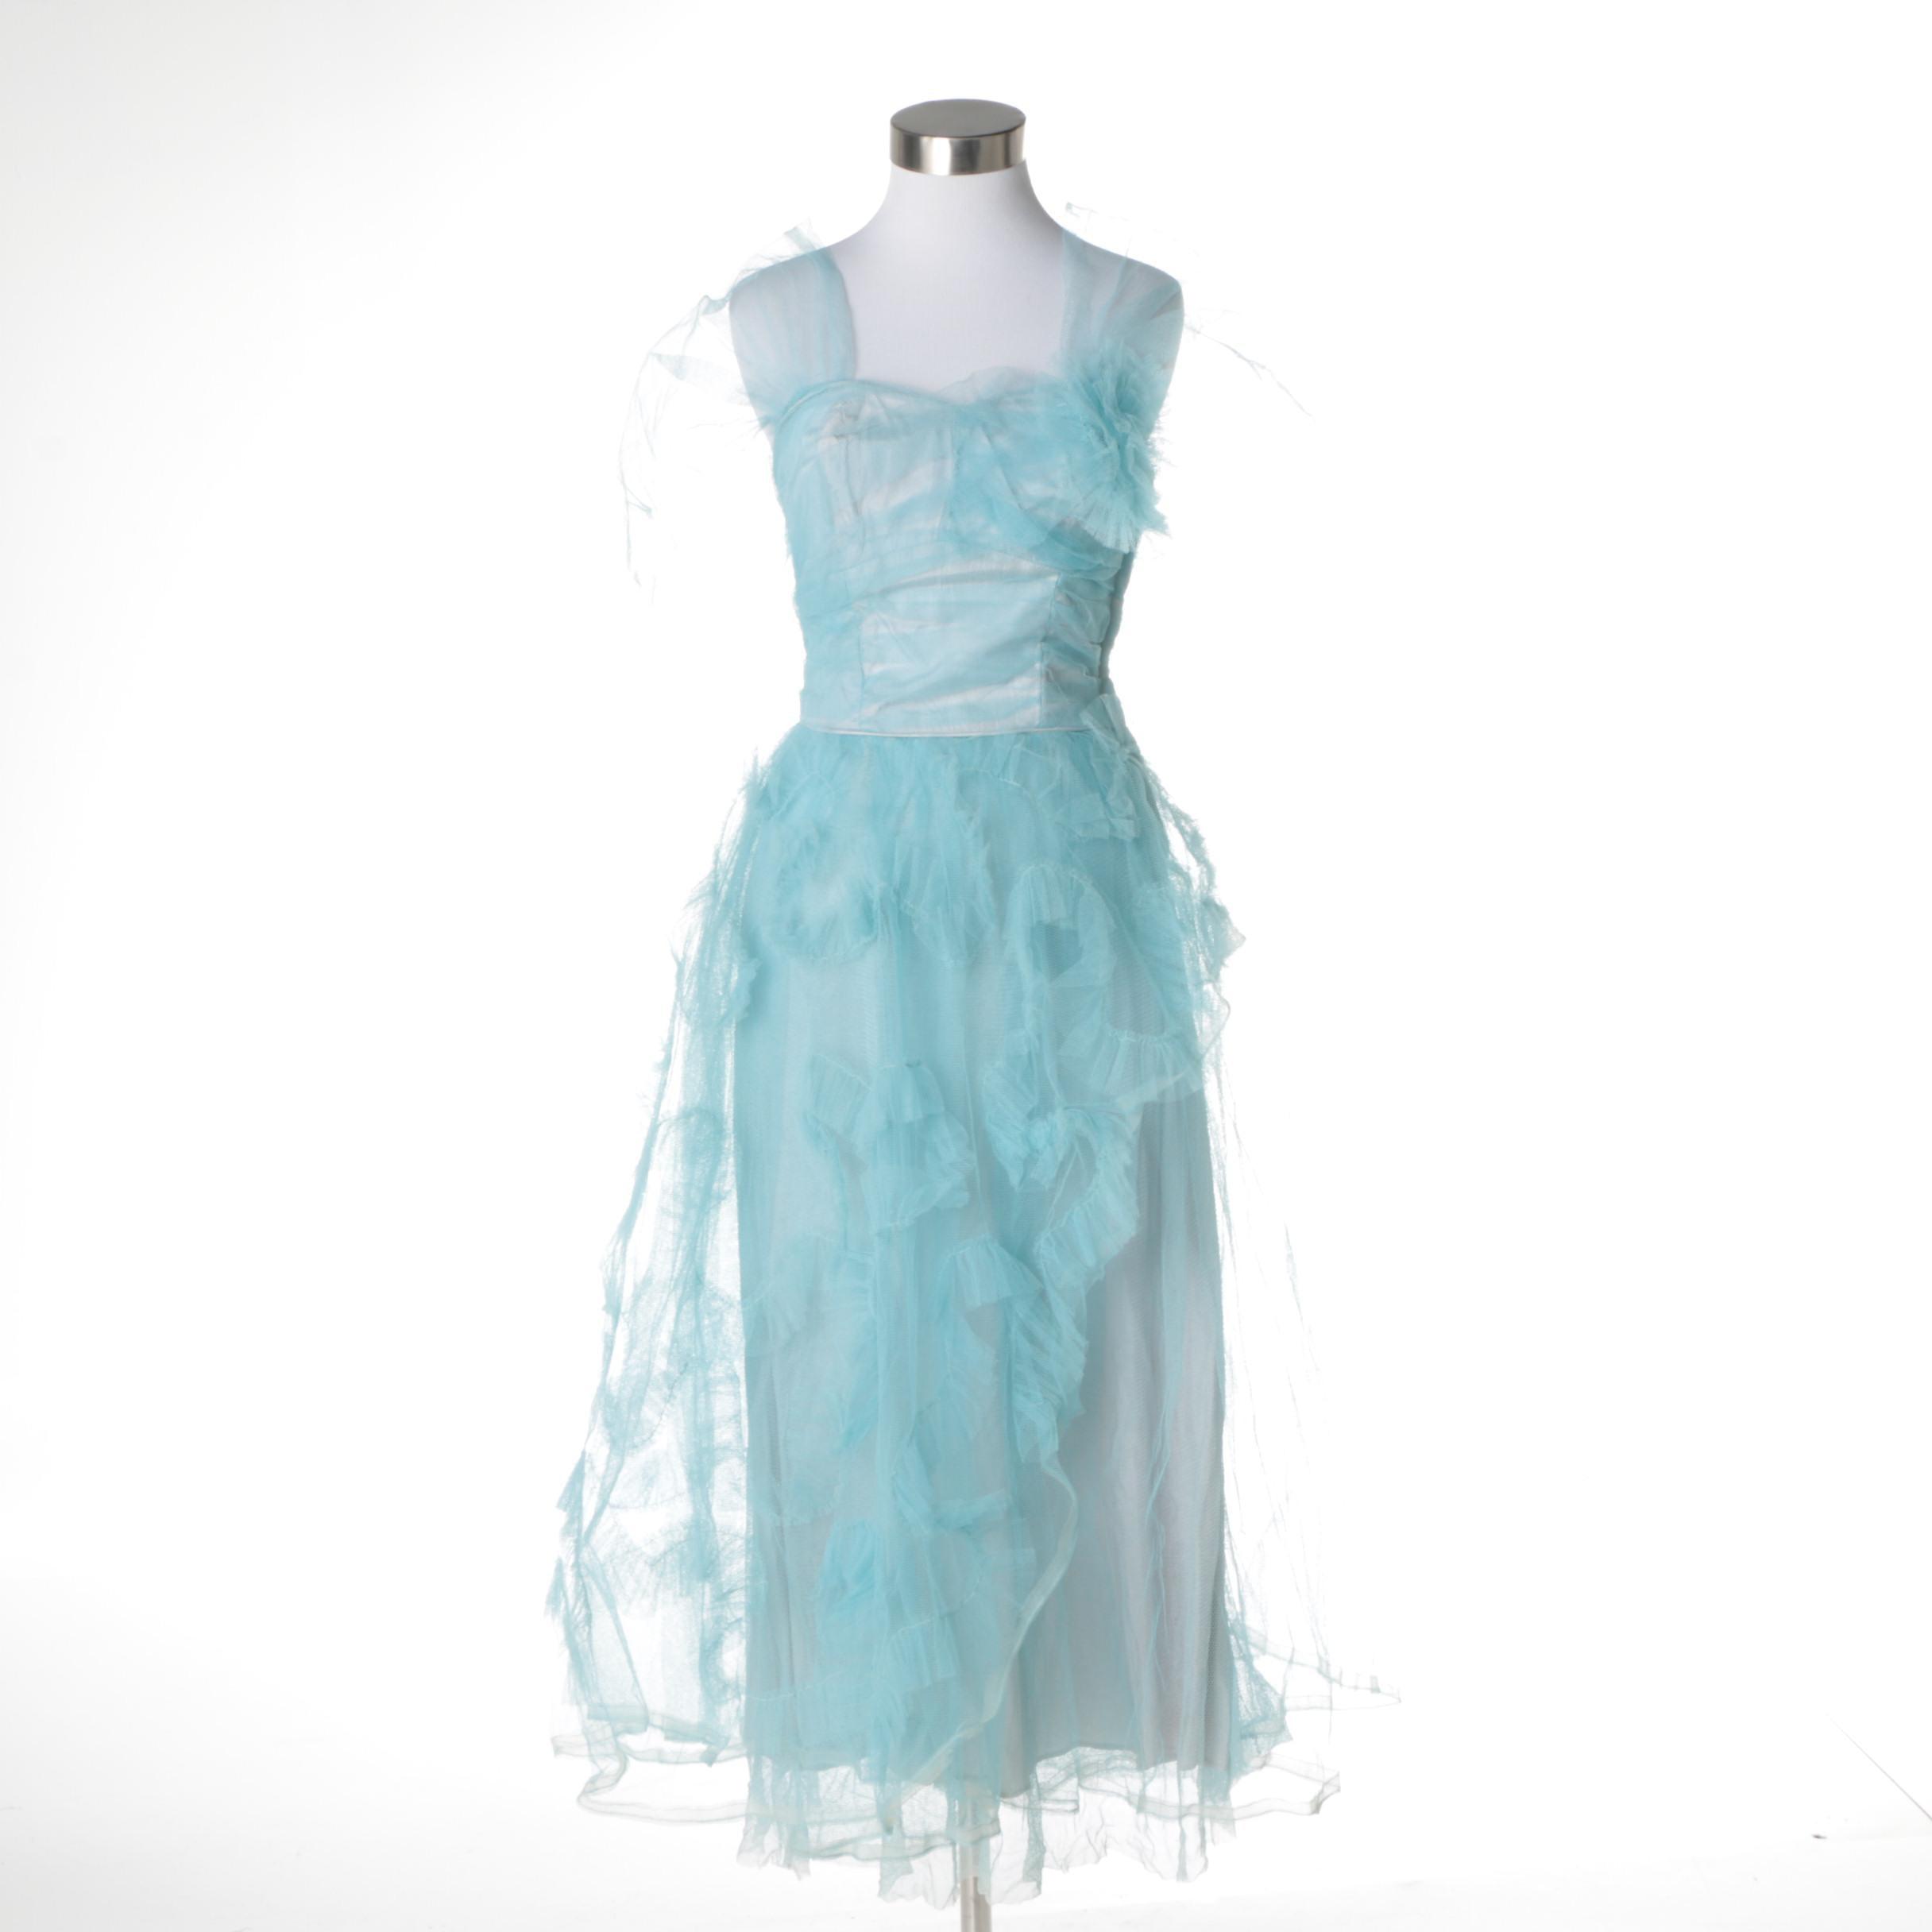 Circa 1950s Vintage Cocktail Dress